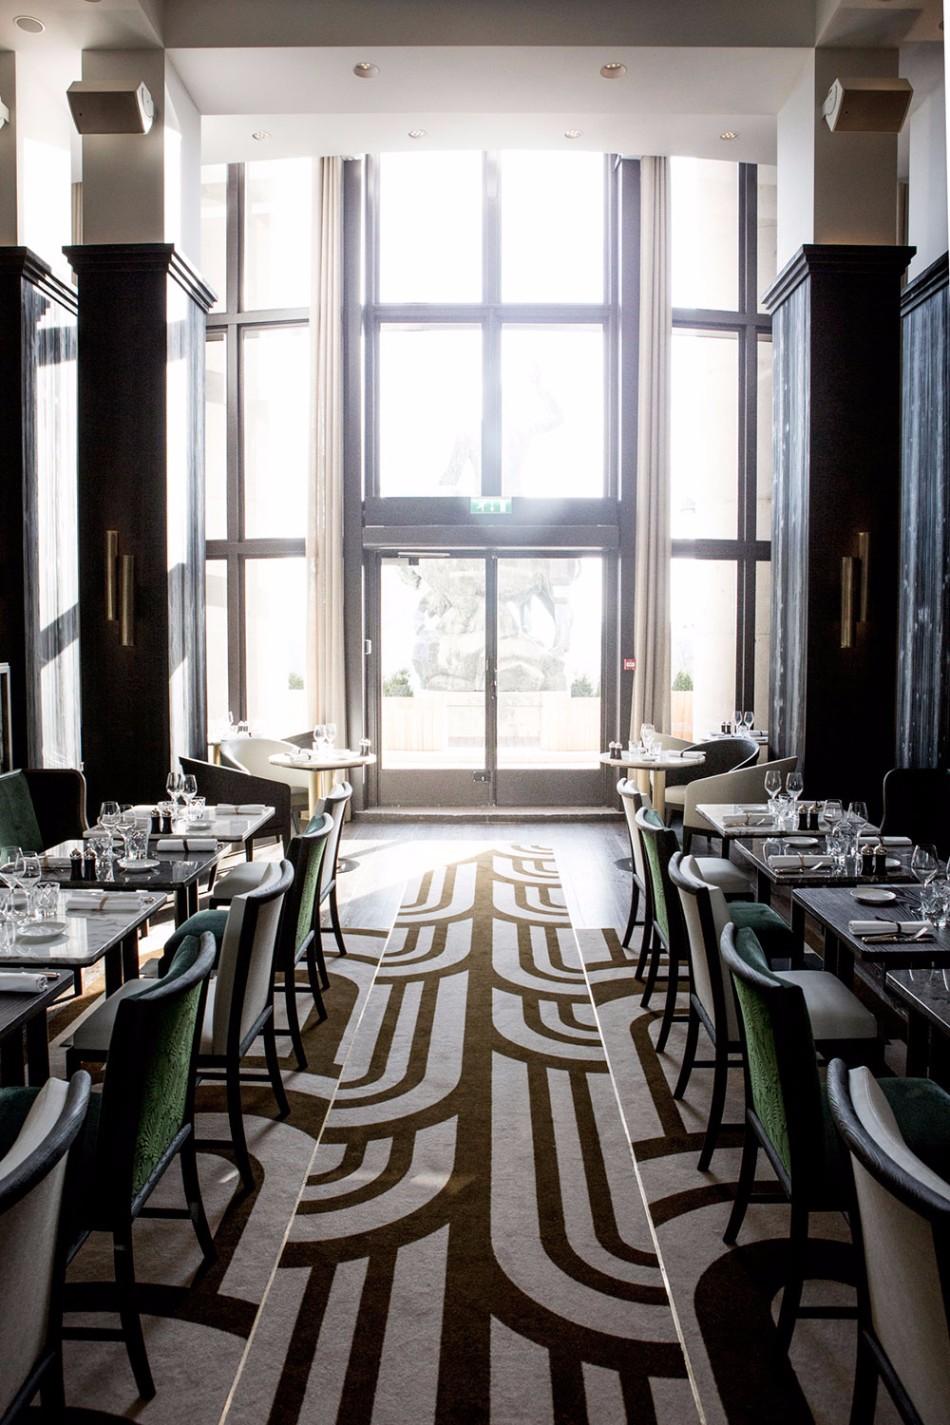 A Parisian Restaurant Designed By Designers Gilles & Boisser | www.bocadolobo.com #interiordesign #luxury #moderndiningtable #restaurants #paris #topinteriordesigners @moderndiningtables interior designer A Parisian Restaurant Designed By Interior Designers Gilles & Boissier A Parisian Restaurant Designed By Interior Designers Gilles Boisser 6